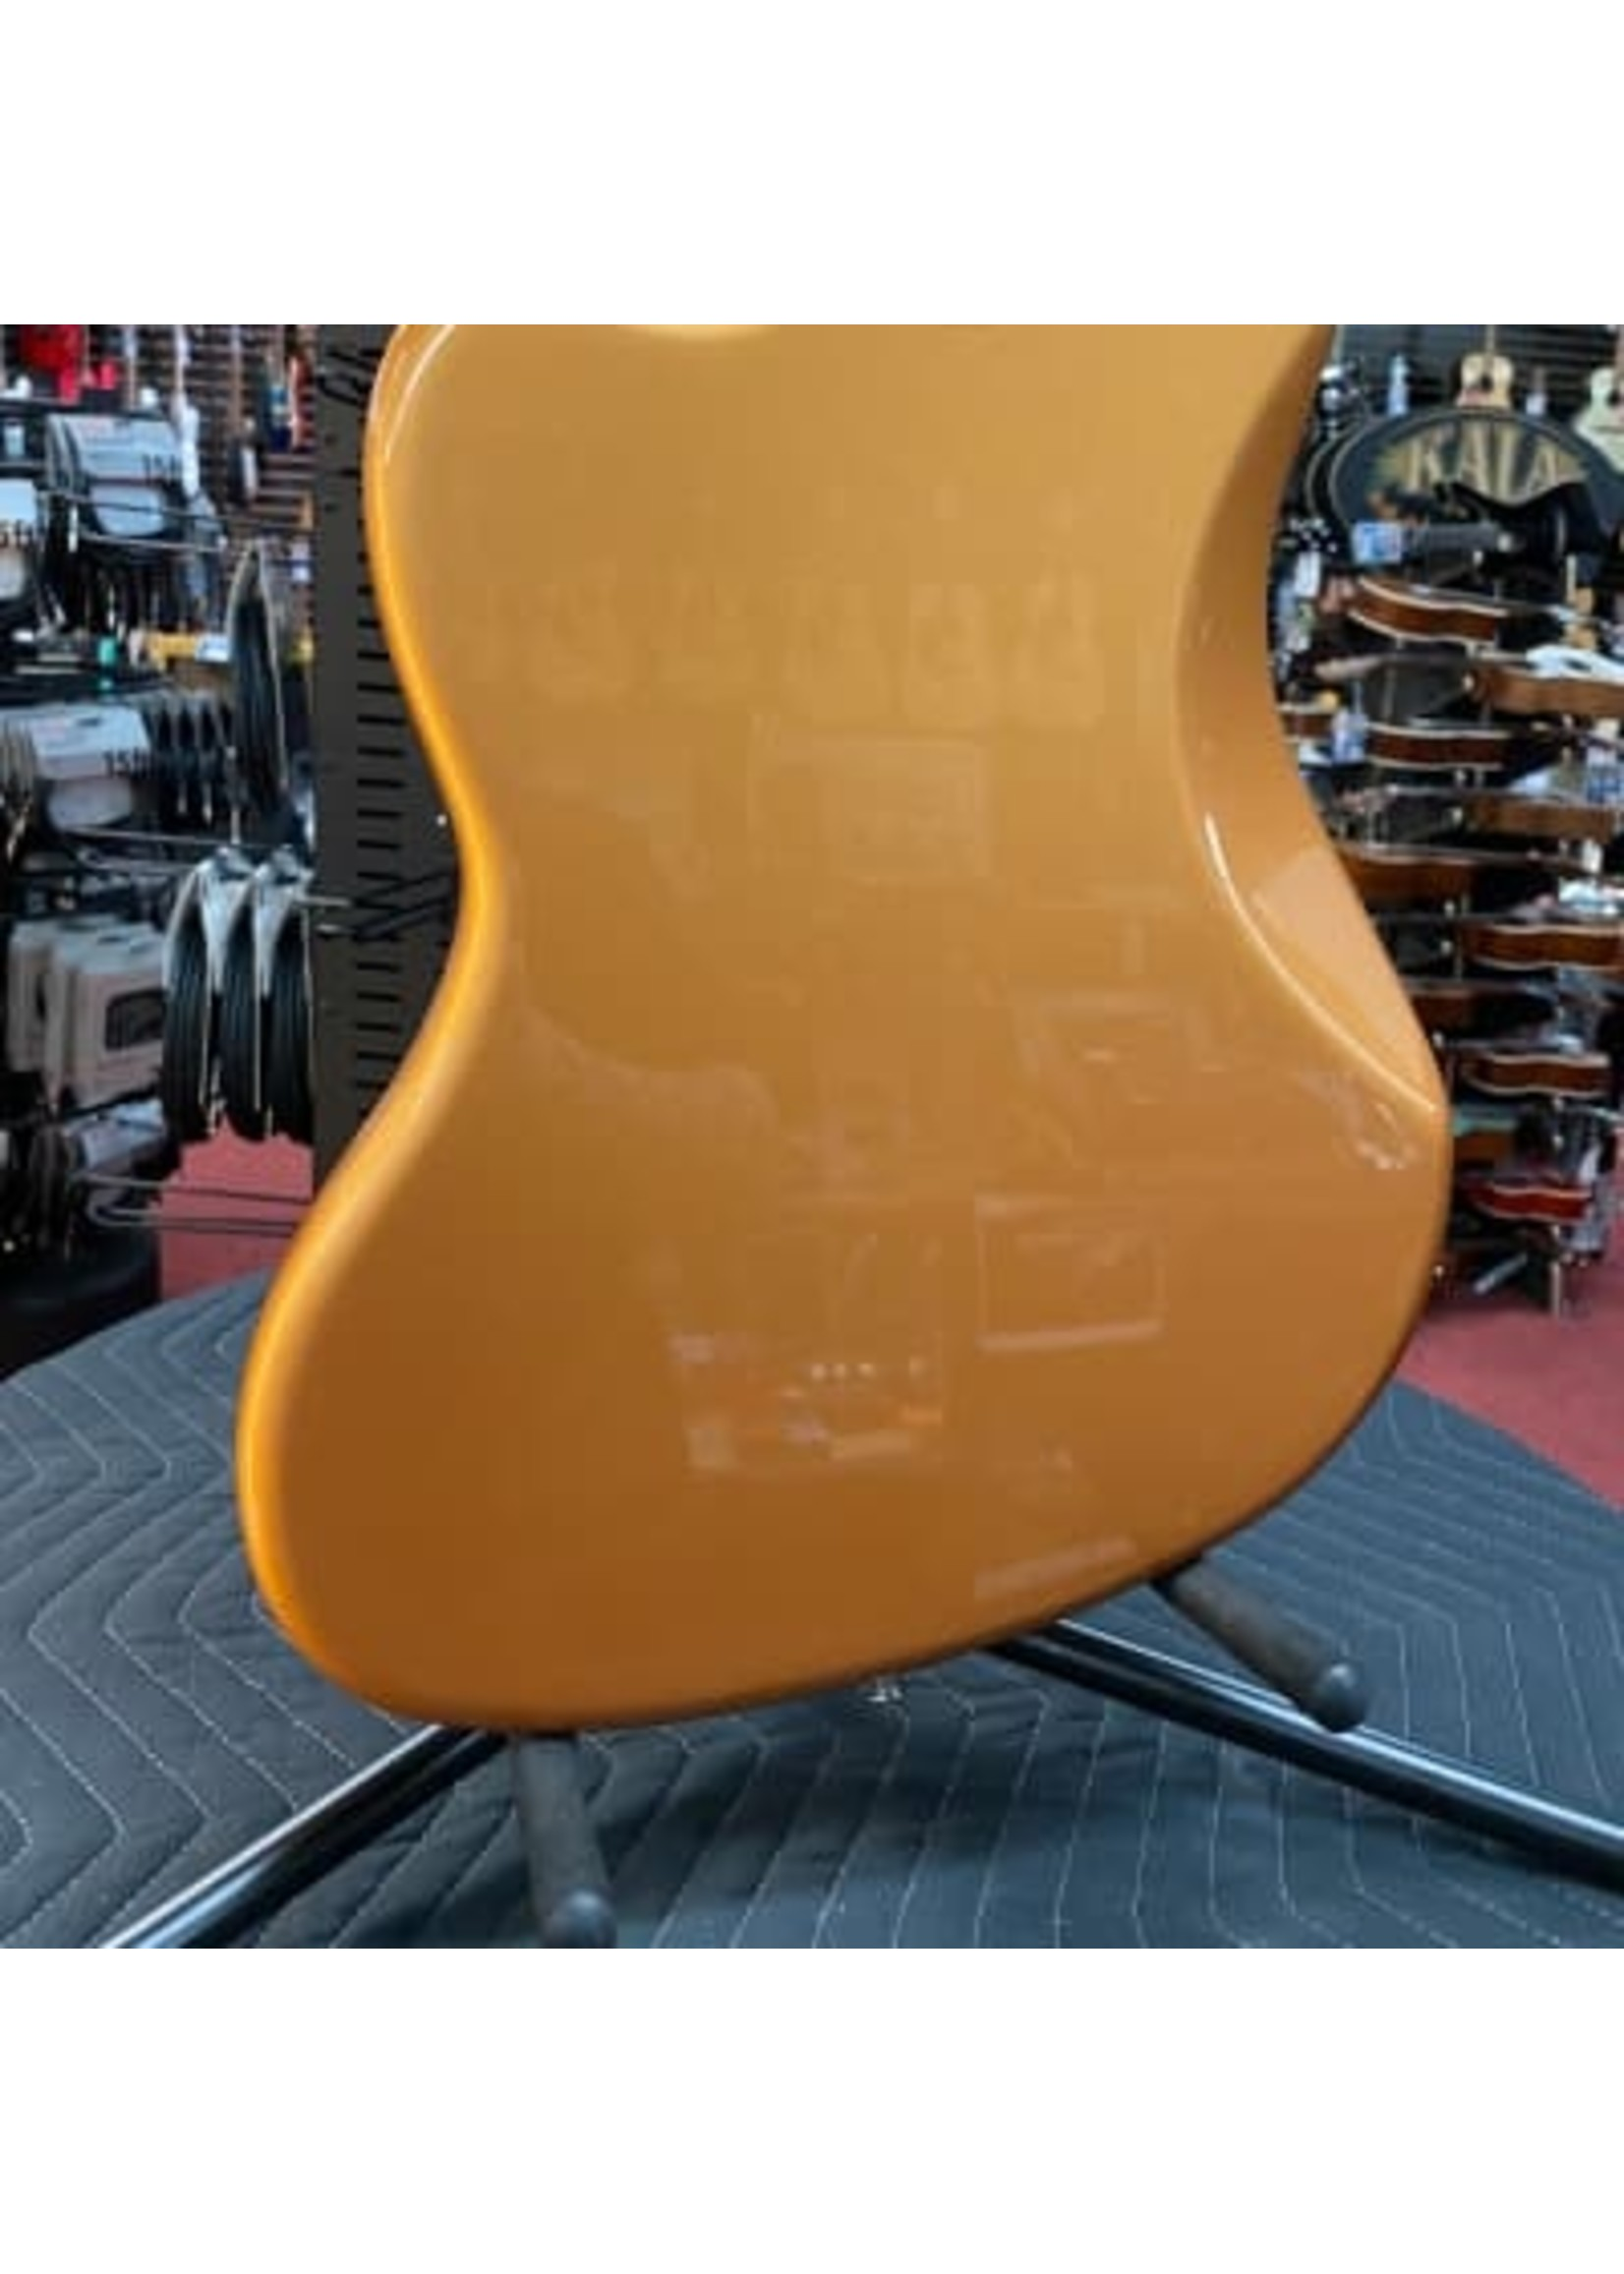 Fender Fender Troy Van Leeuwen Jazzmaster®, Bound Maple Fingerboard, Copper Age